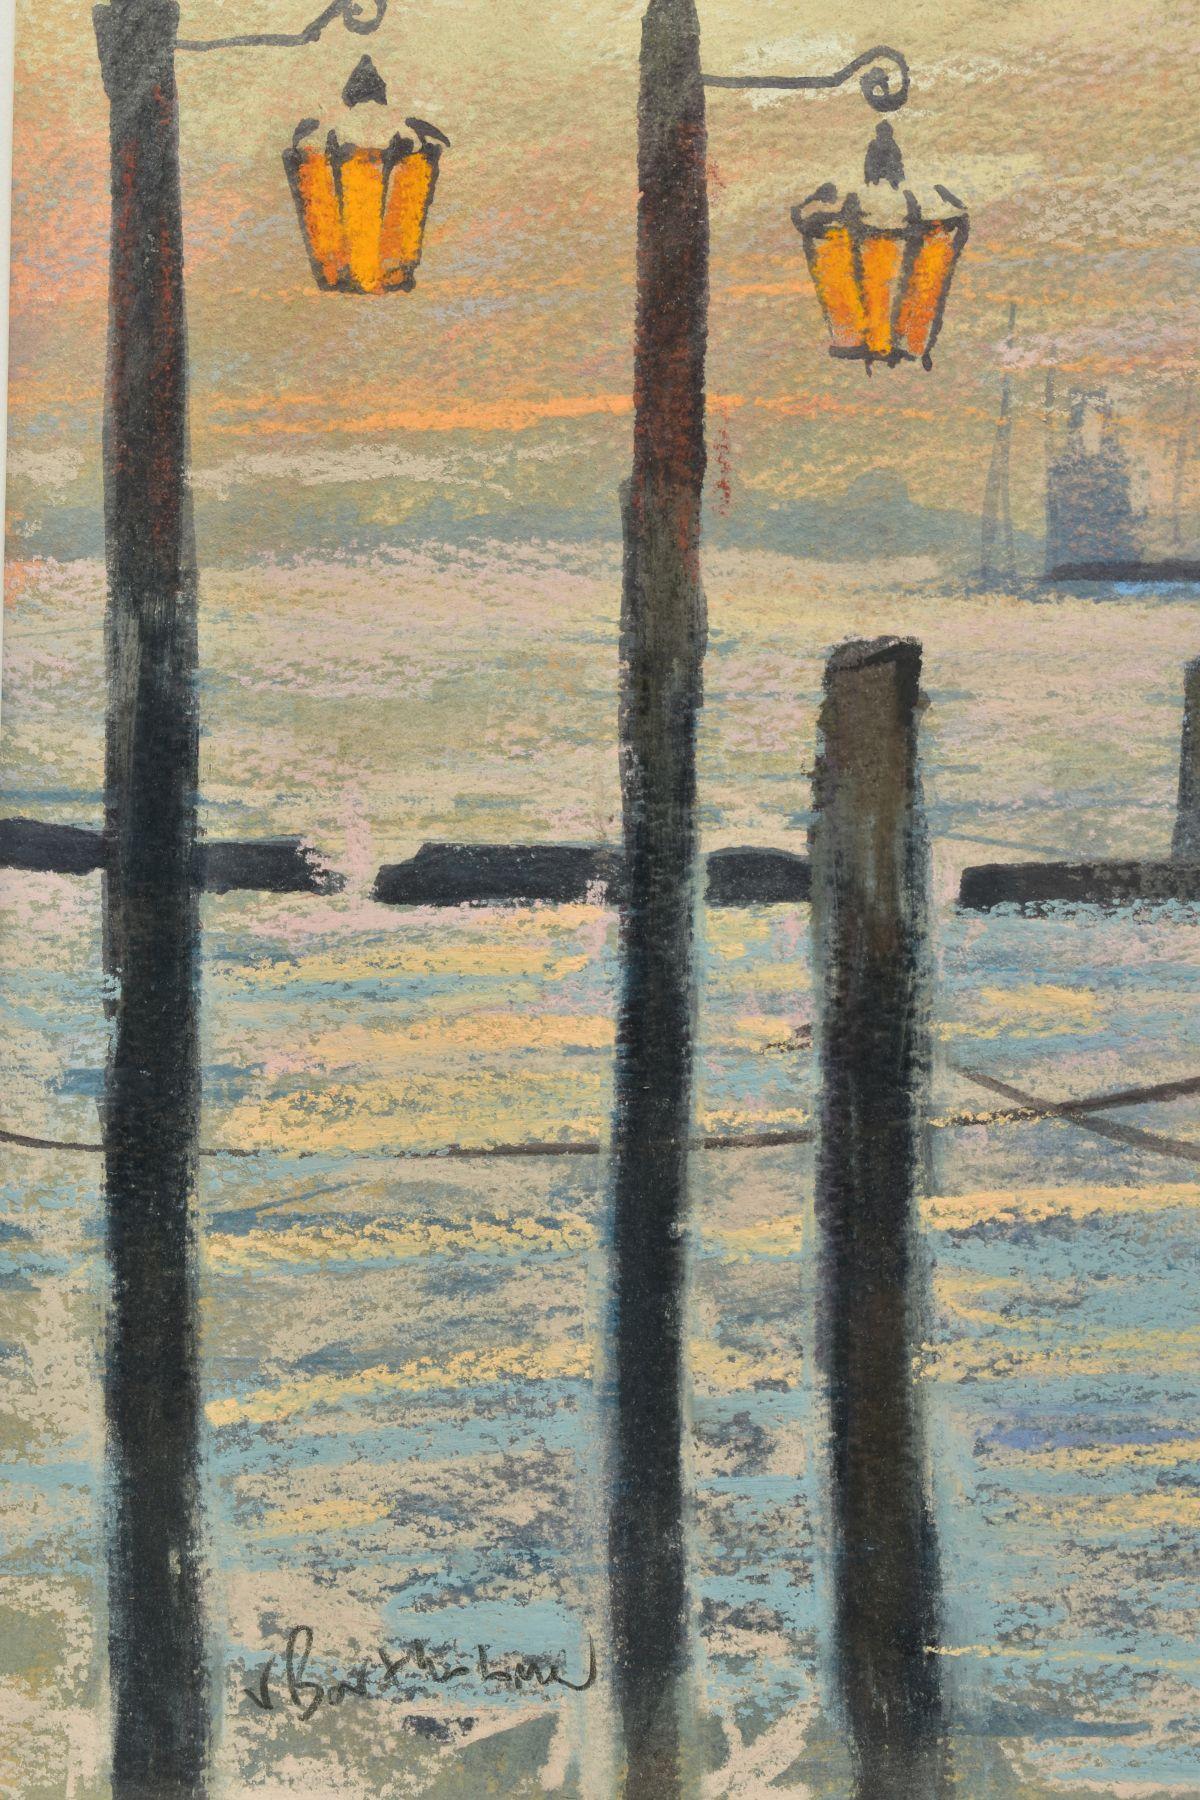 JAMES BARTHOLOMEW (BRITISH CONTEMPORARY), 'Towards San Giorgio, First Light', a Venetian scene - Image 4 of 7